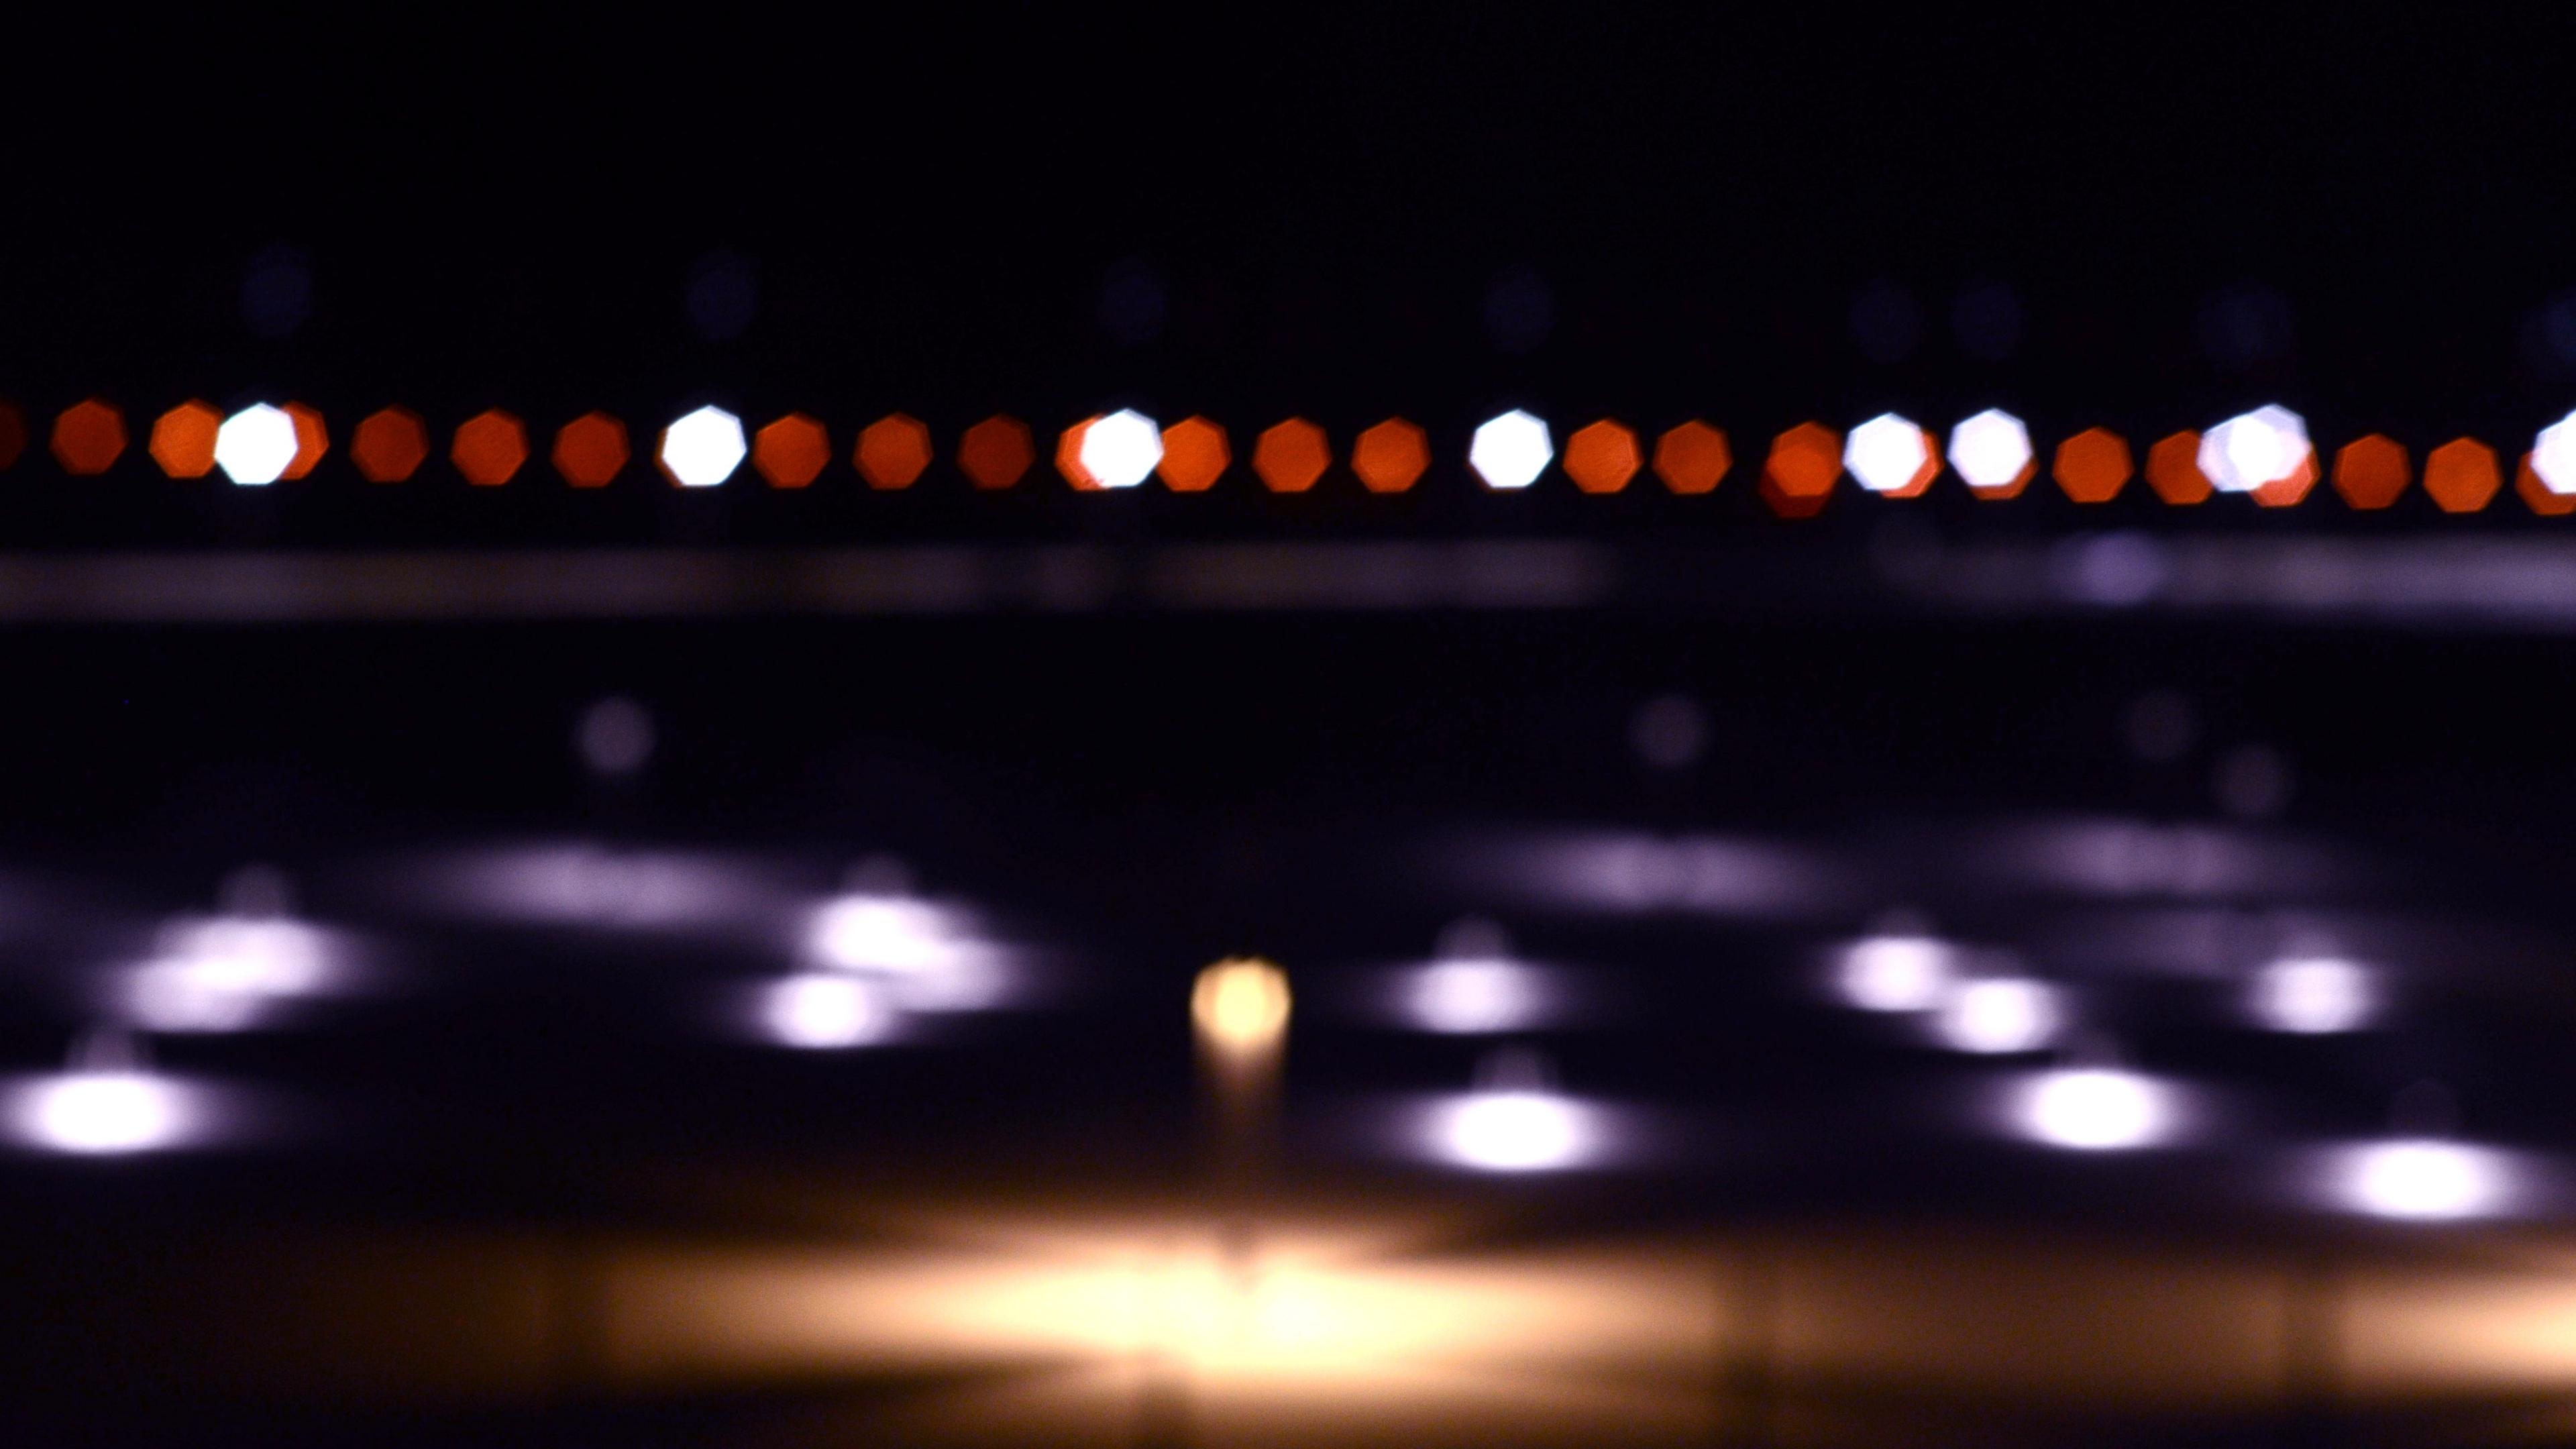 glare circles spots light 4k 1539369830 - glare, circles, spots, light 4k - spots, glare, Circles